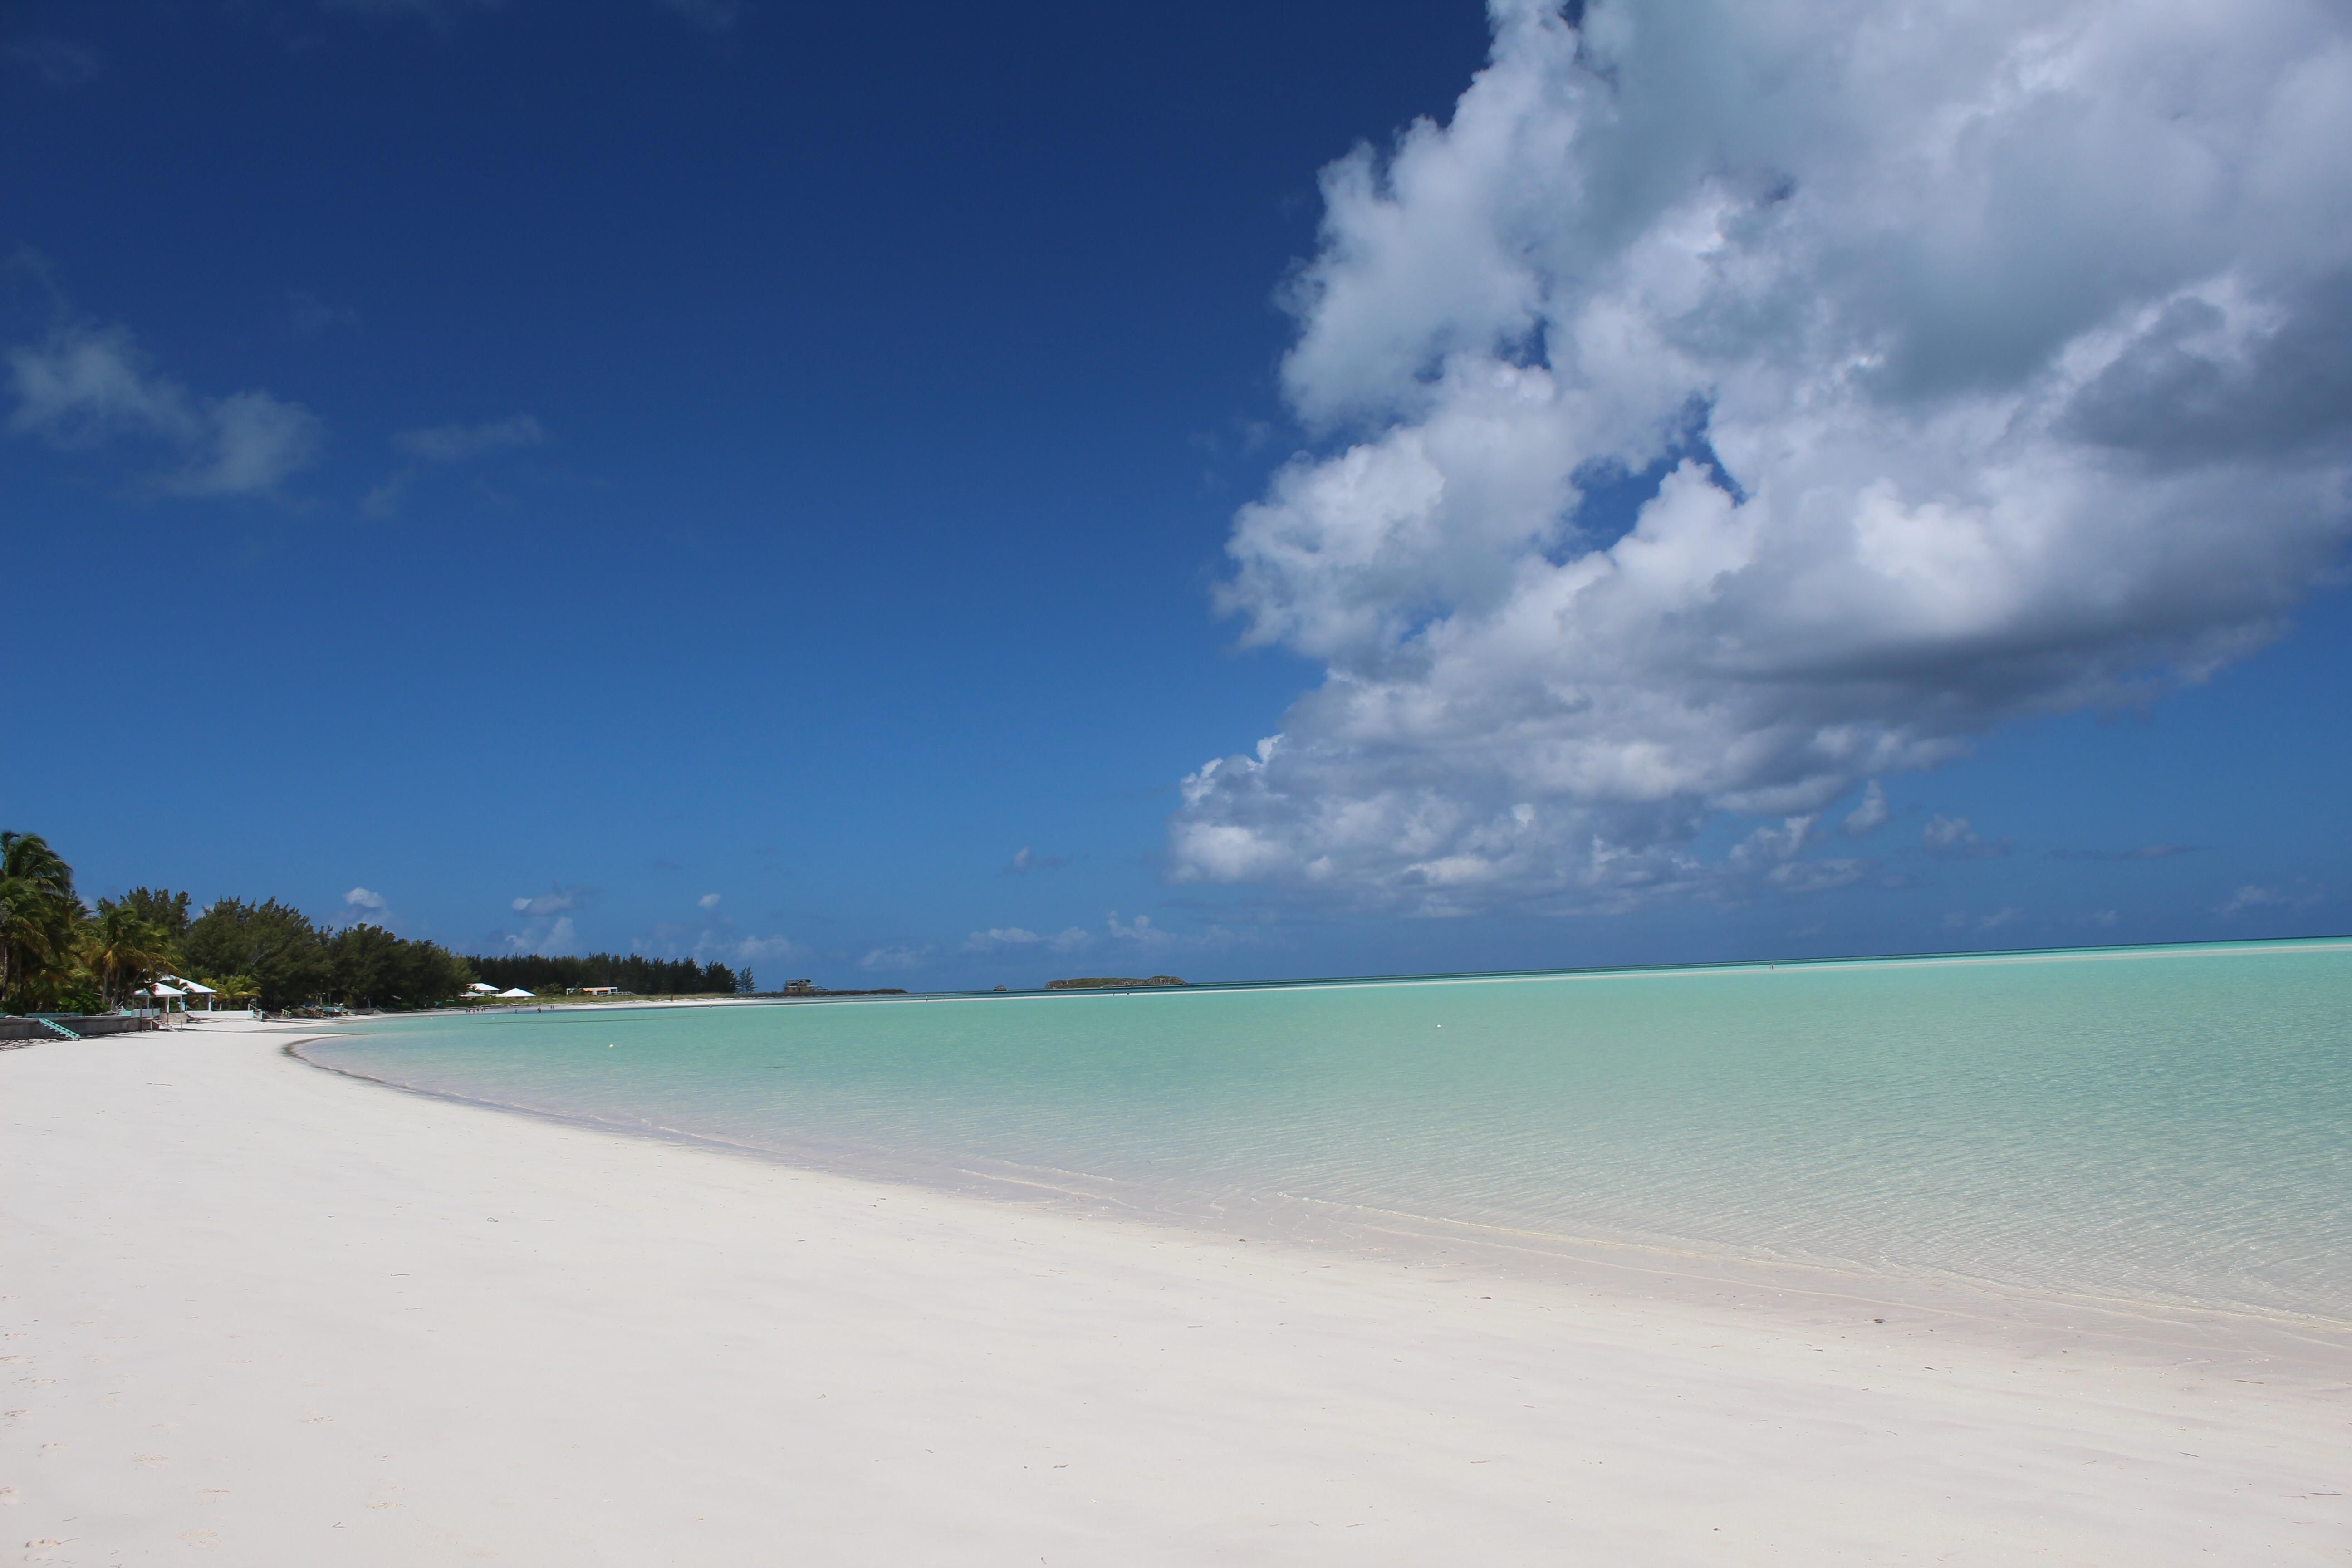 spanish wells bahamas #beach #travel #holiday #sand #nature